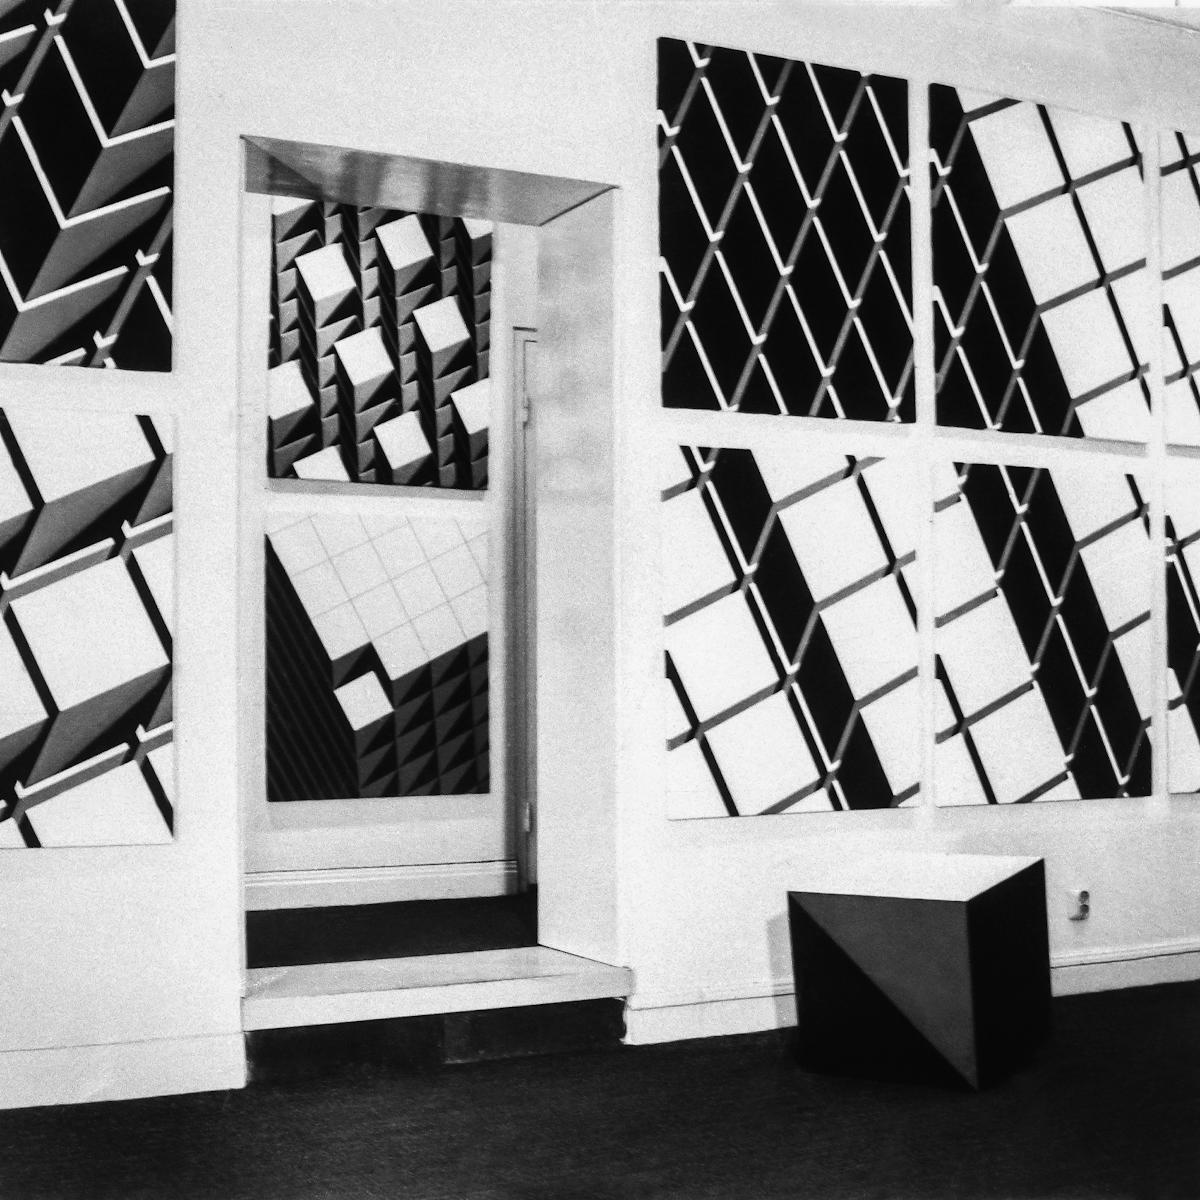 Zbigniew Geppert, Cub'art, Galeria Aronowitsch wSztokholmie, 1970